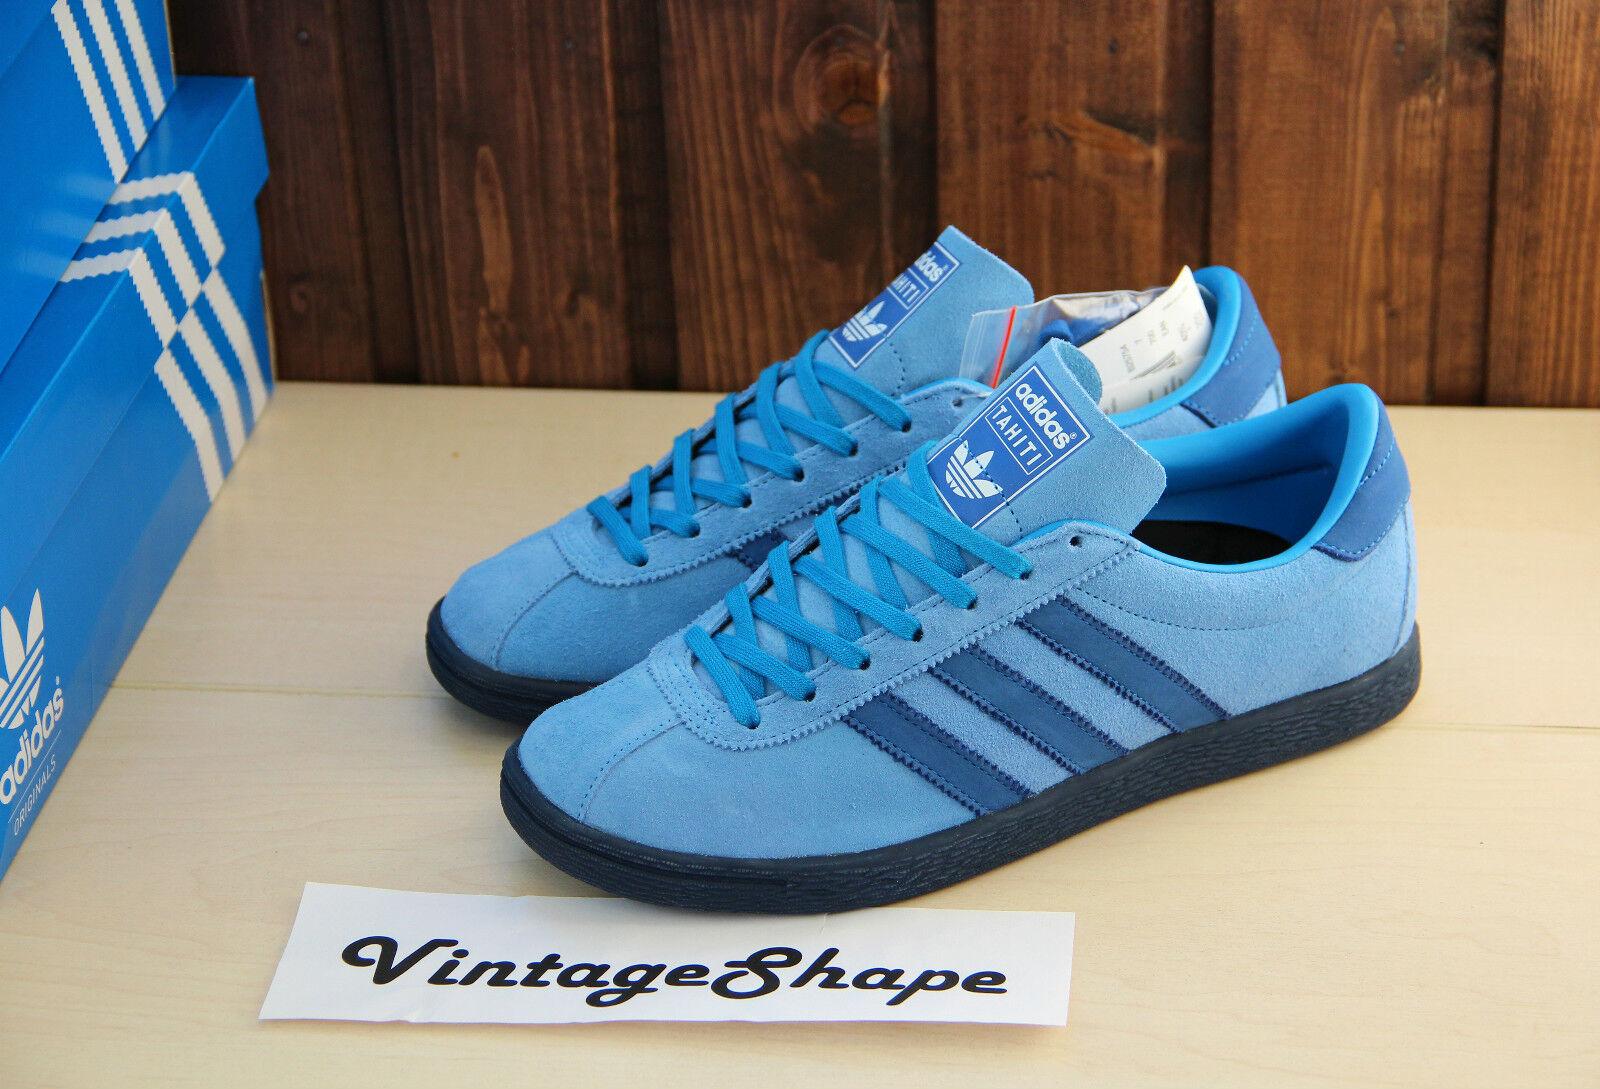 Adidas Originals Tahiti Island B25754 Luz Azul/Collegiate Navy Series B25754 Island Hawaii 78ecb6